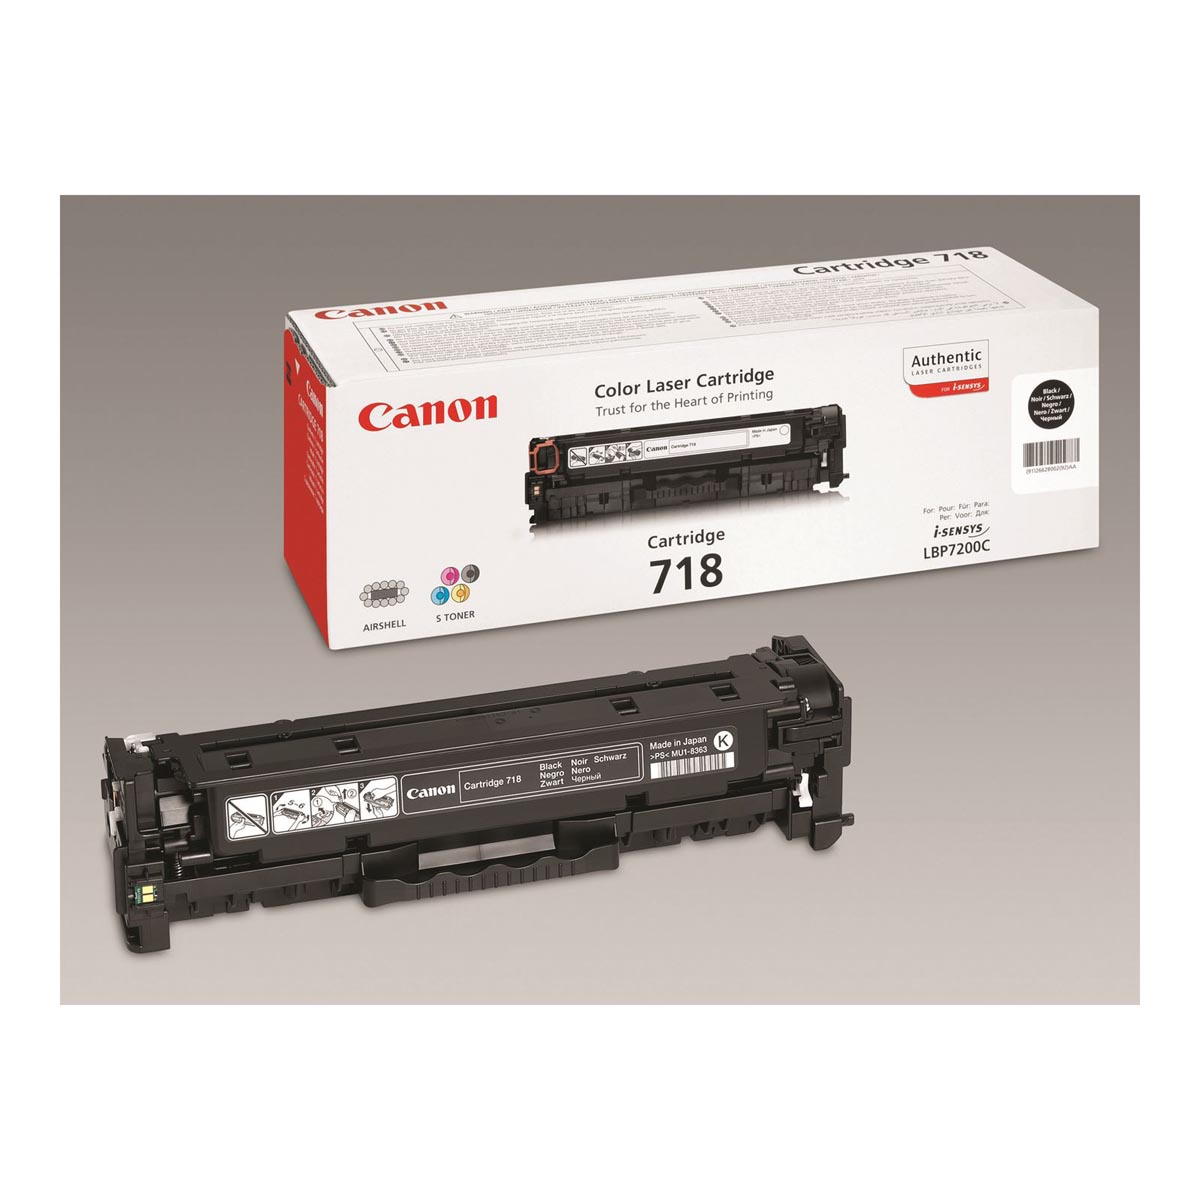 Canon toner 718BK - 3.400 pagina's, OEM 2662B005, duopack, zwart